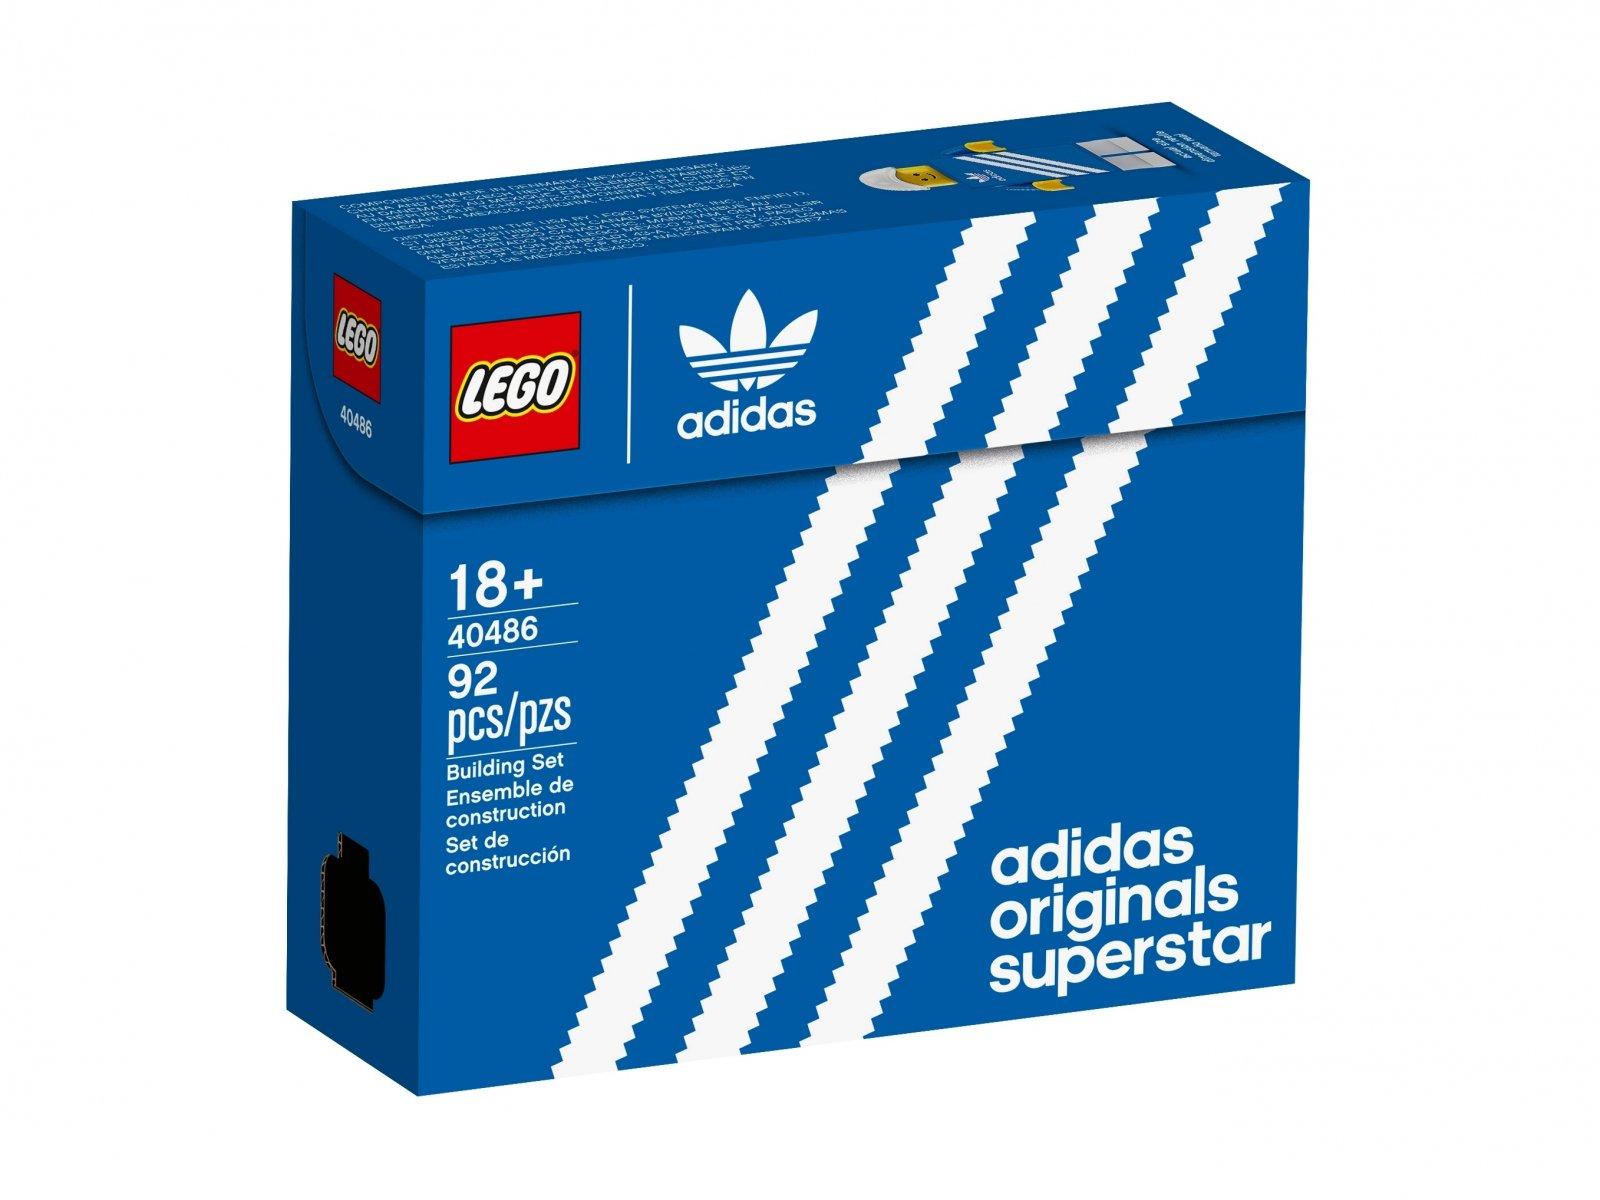 LEGO 40486 But adidas Originals Superstar